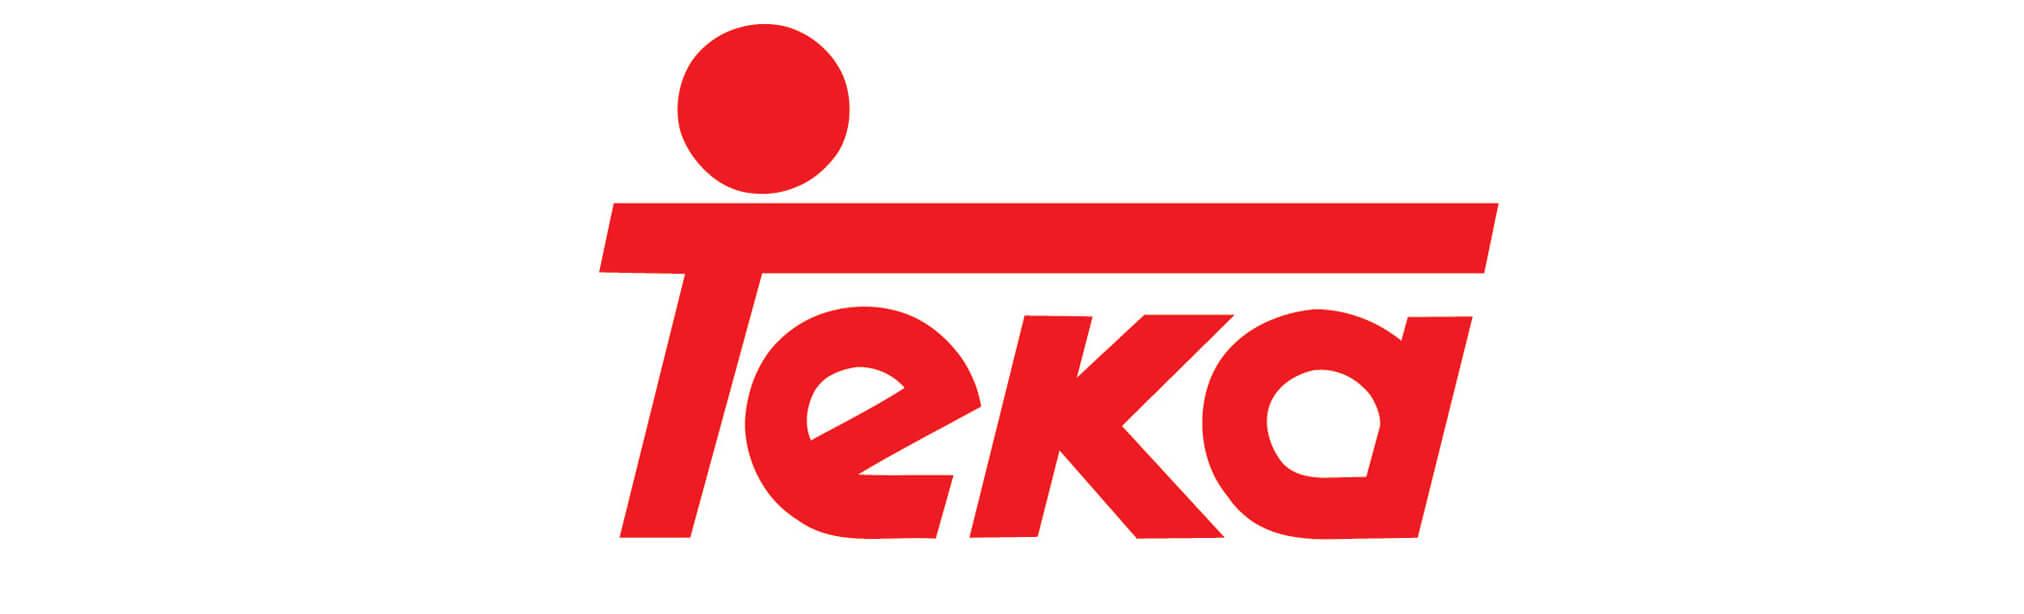 Logo Cong Ty Teka